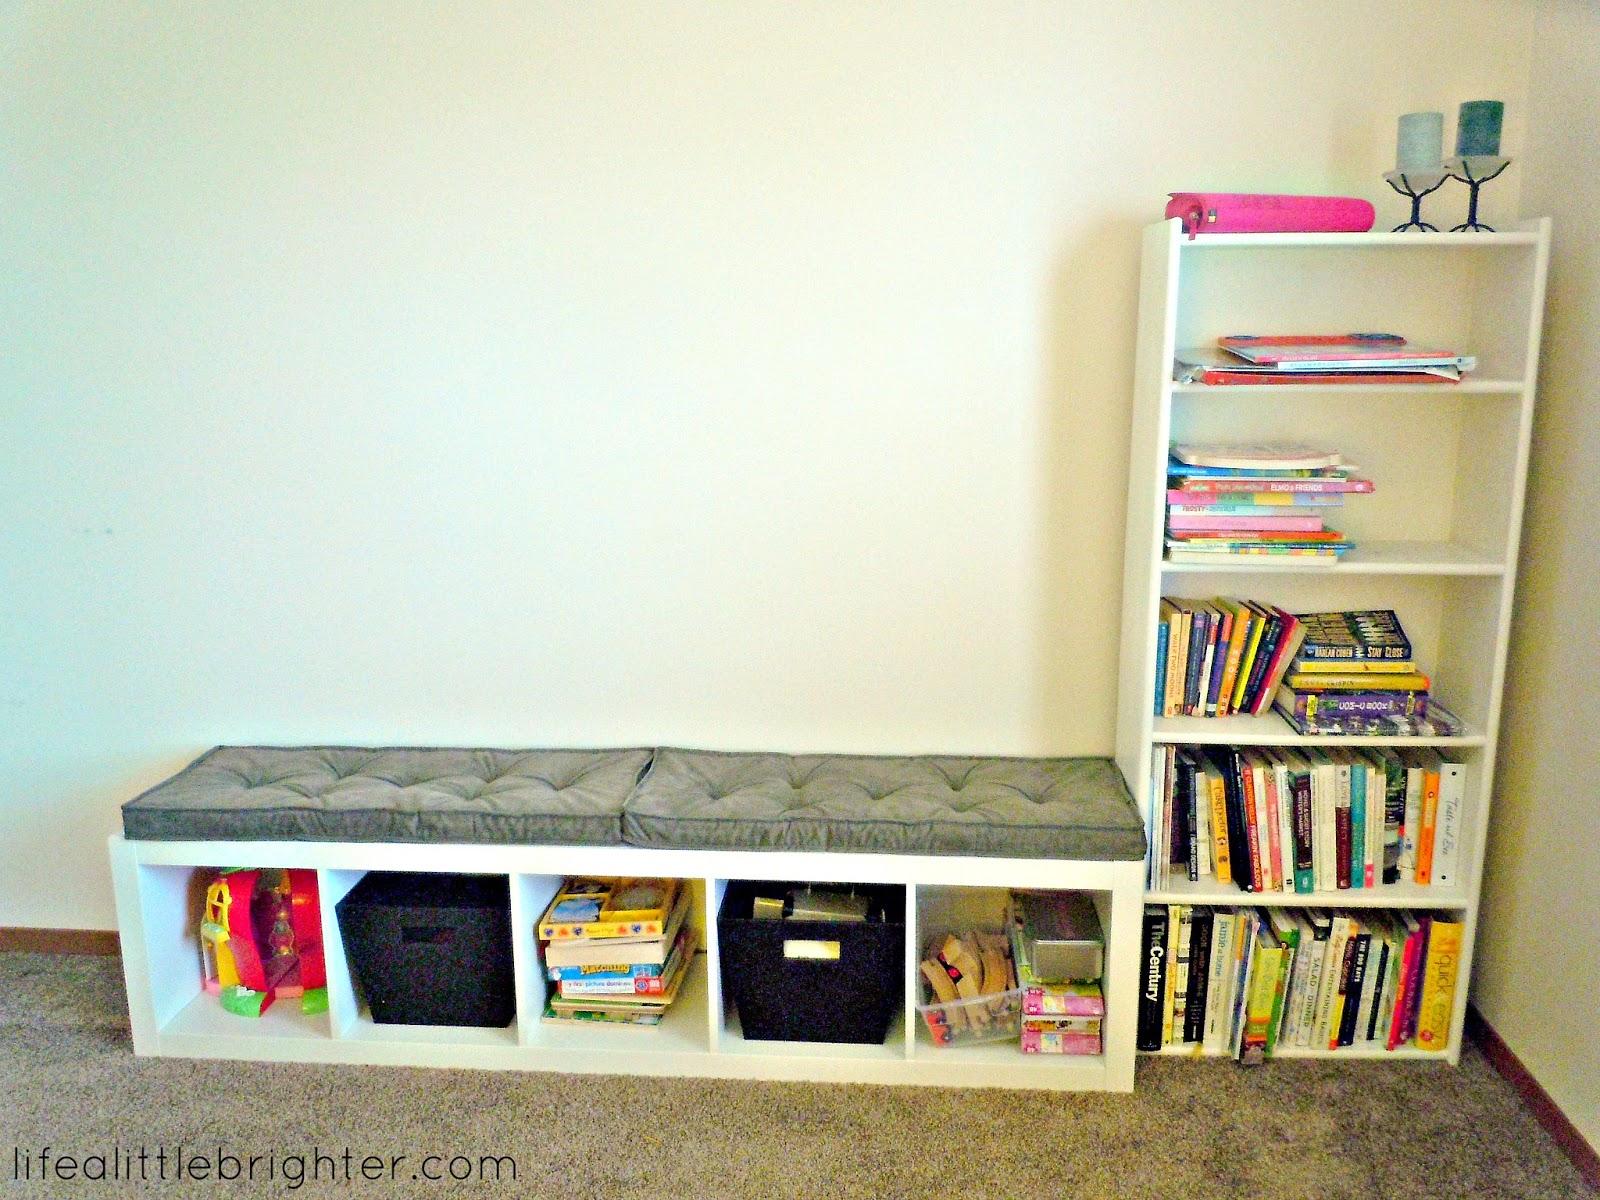 Ikea Hack Bookcase: IKEA Hack: Expedit Bookcase